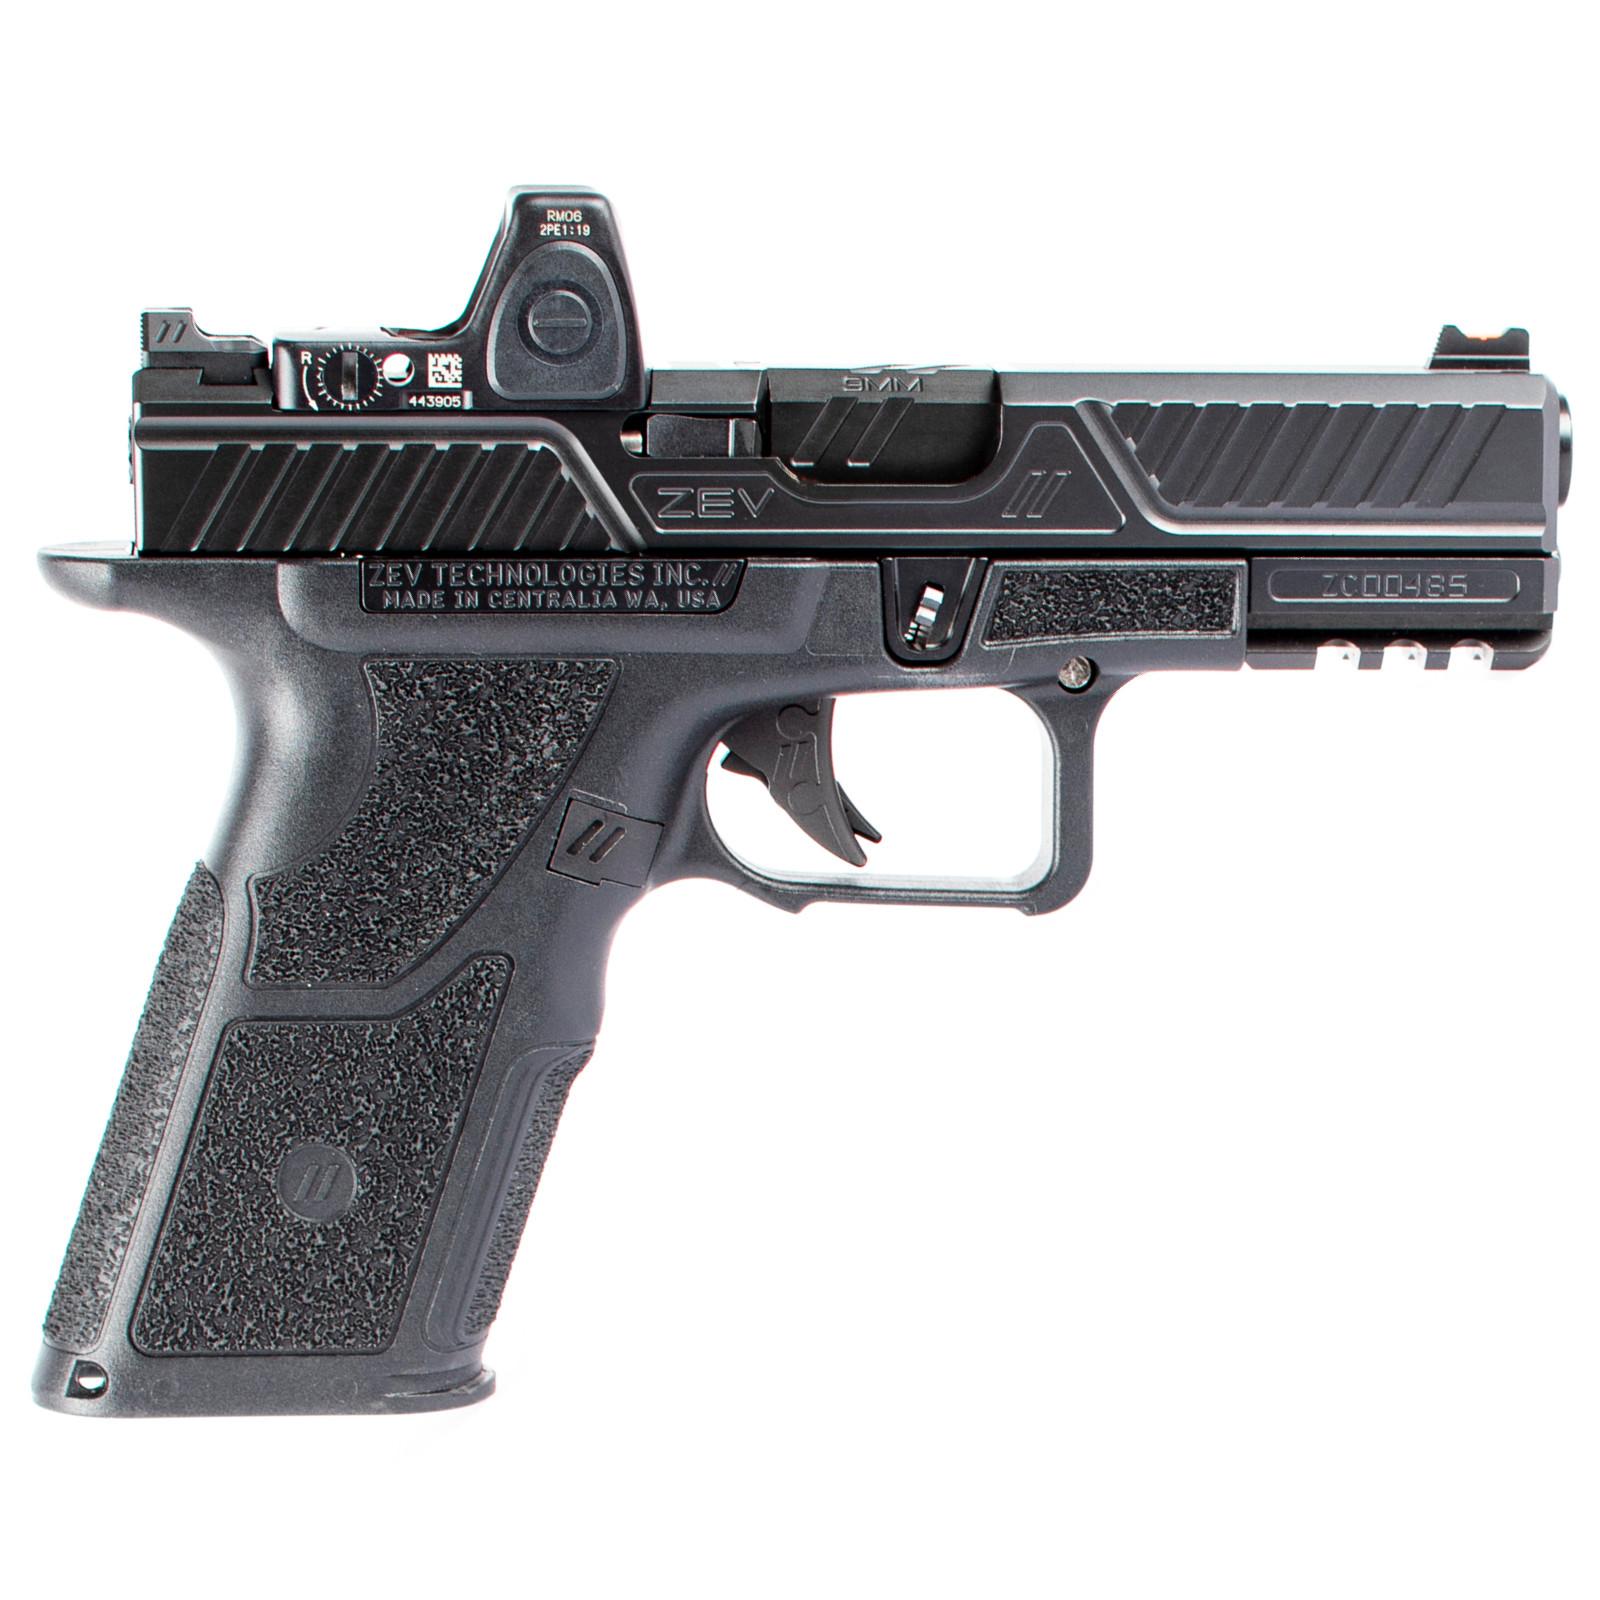 zev technologies oz9c x combat pistol glock pattern 9mm